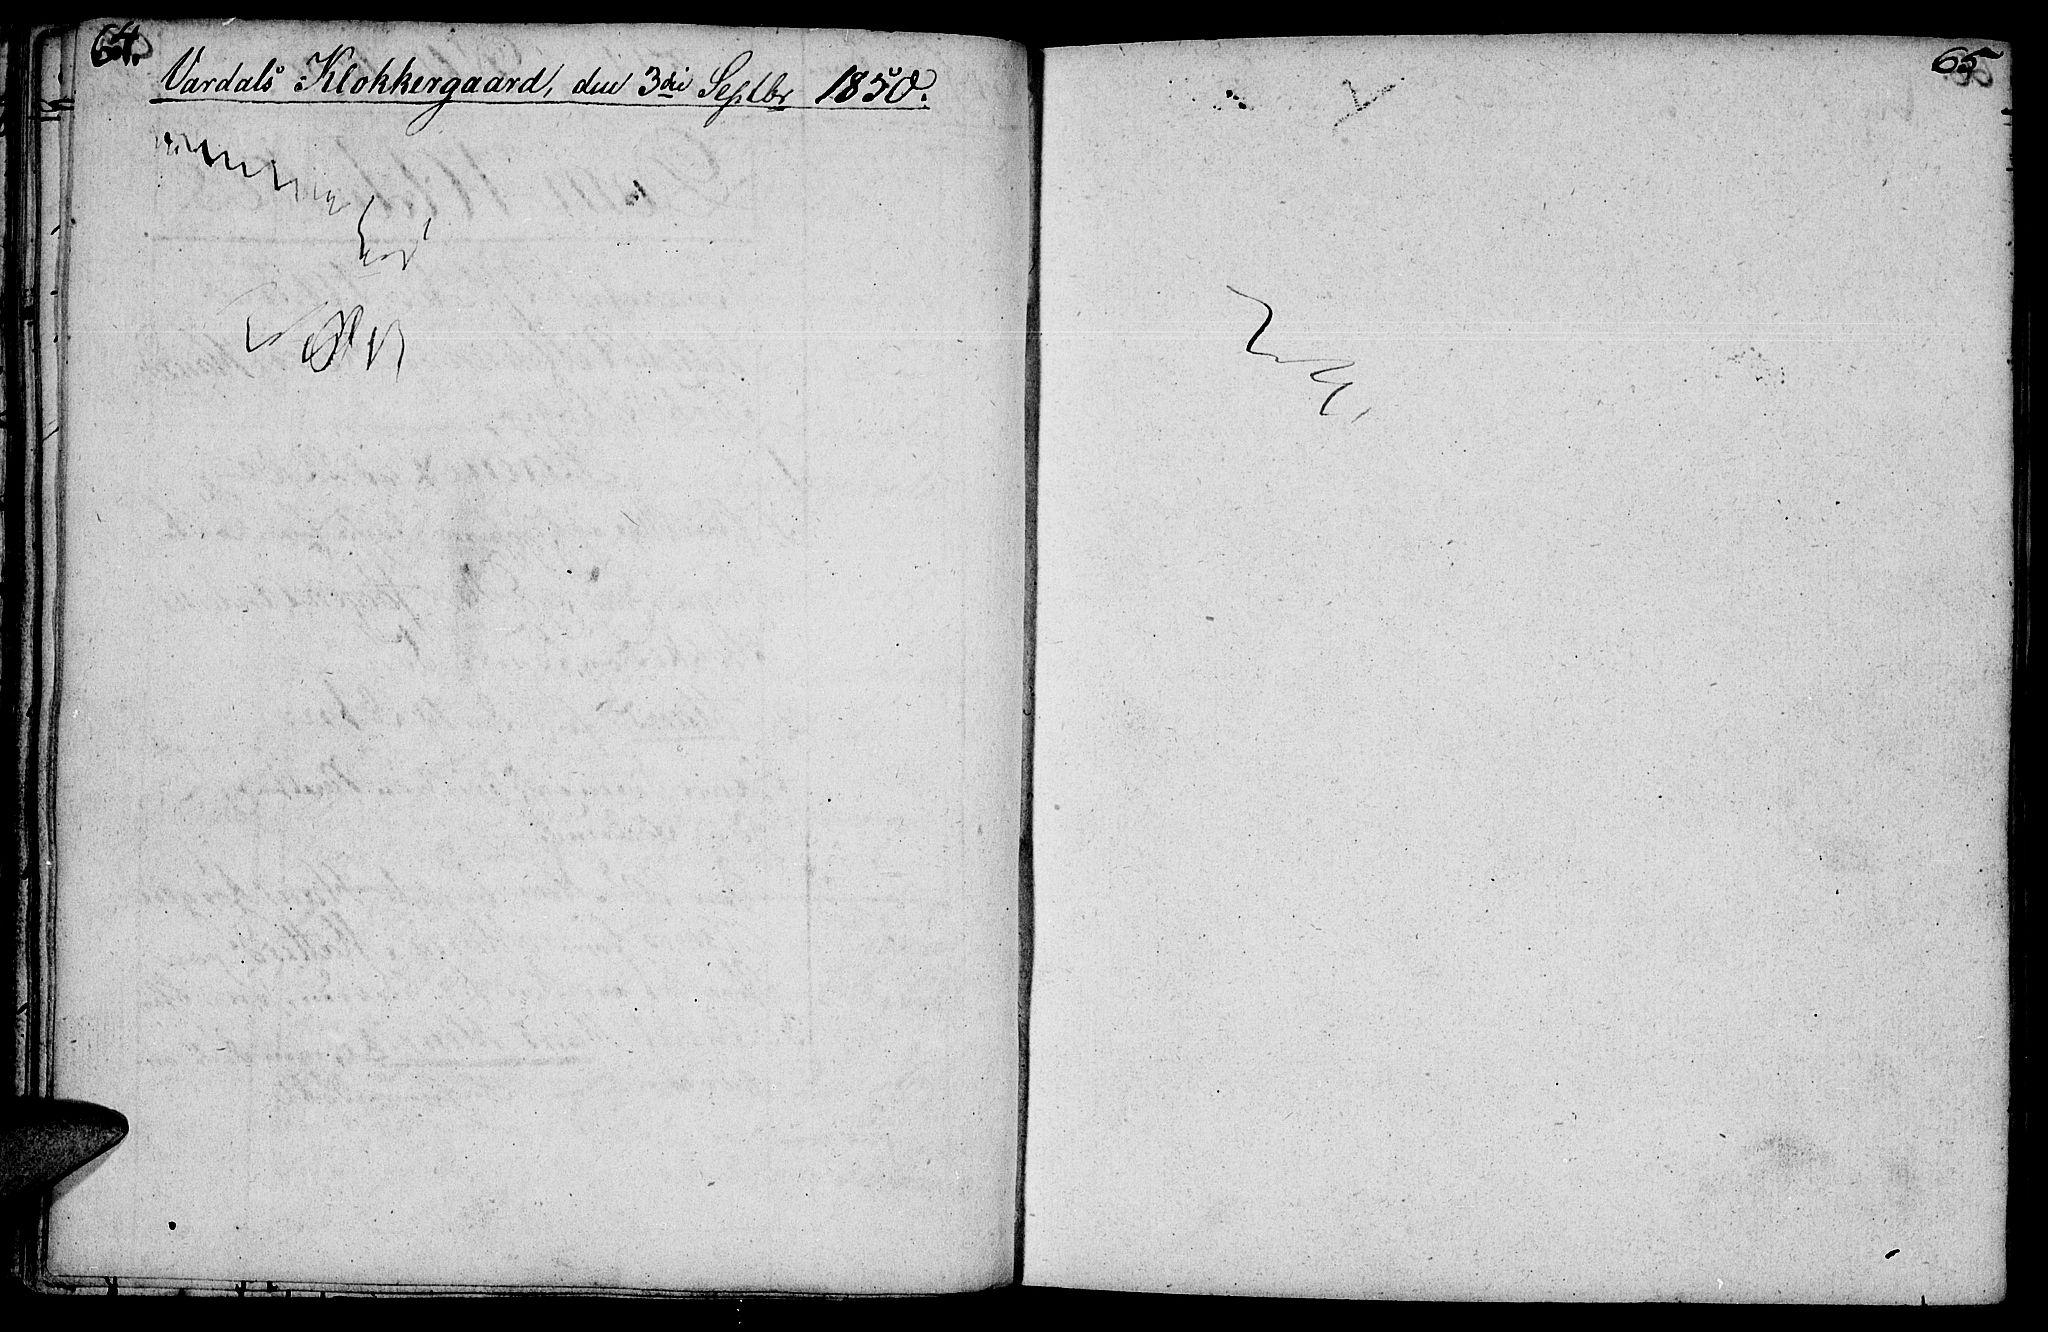 SAH, Vardal prestekontor, H/Ha/Hab/L0003: Klokkerbok nr. 3, 1803-1808, s. 64-65